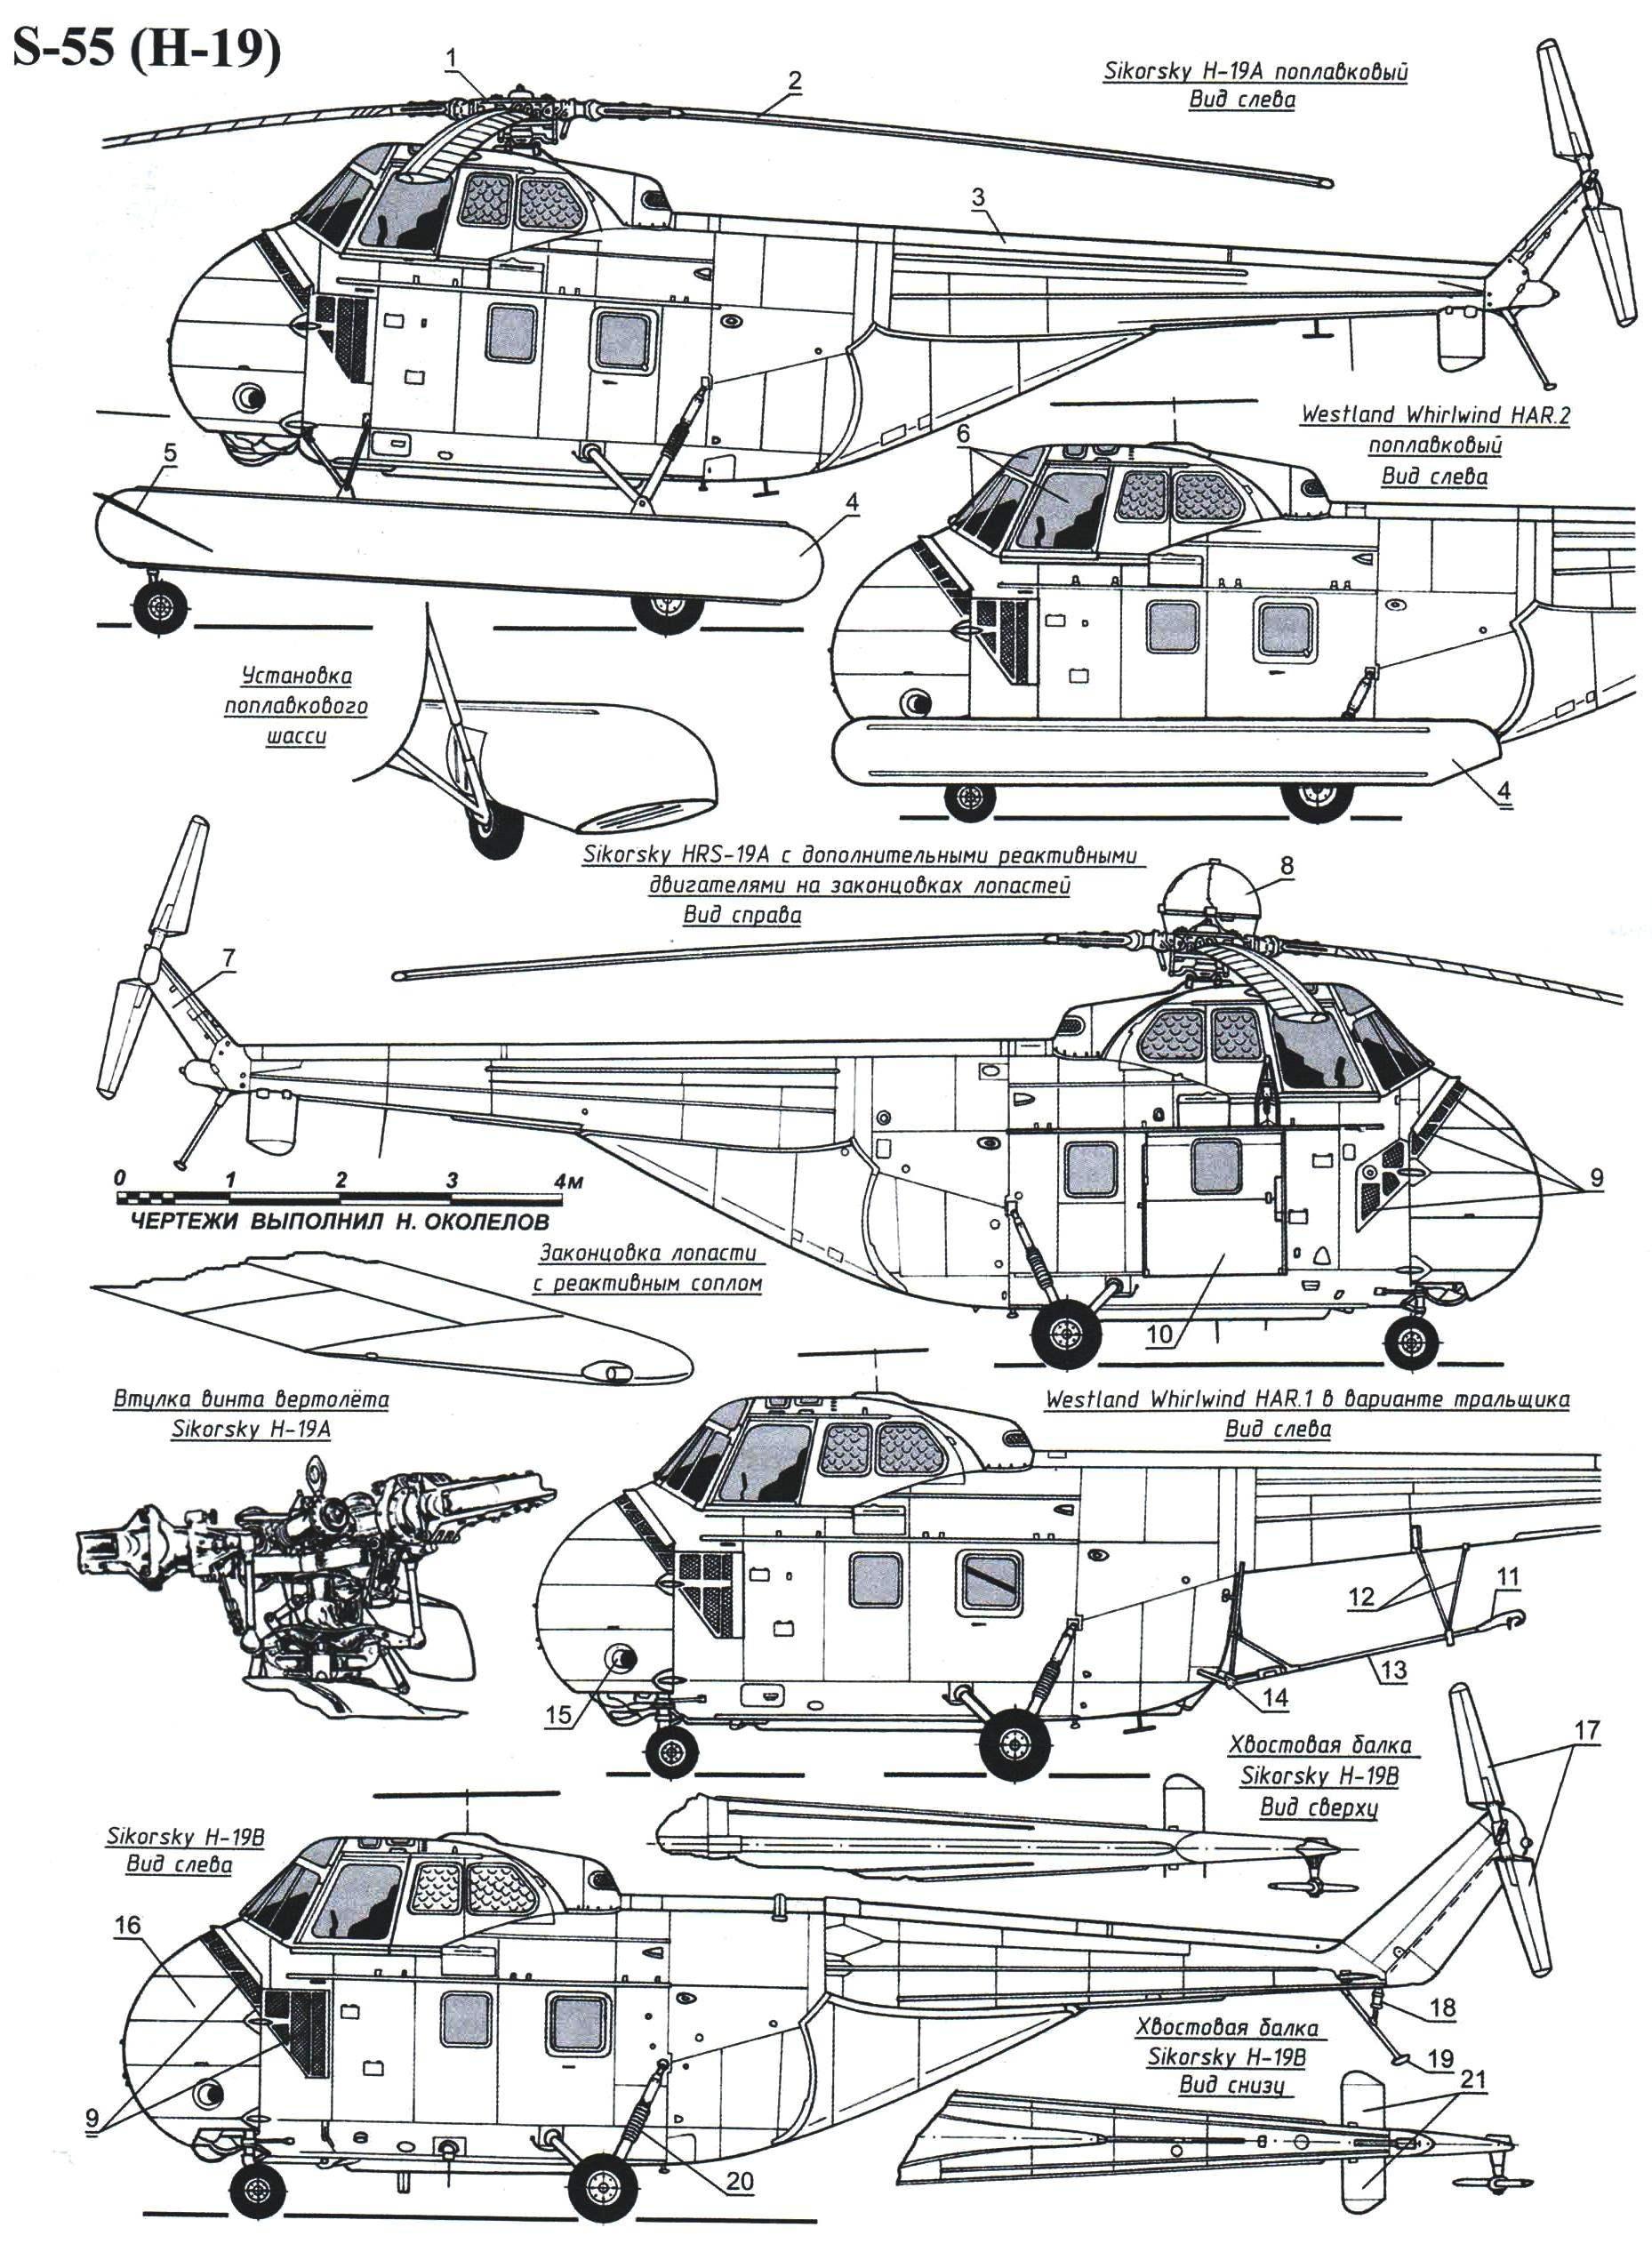 Вертолёт S-55 конструкции И.Сикорского